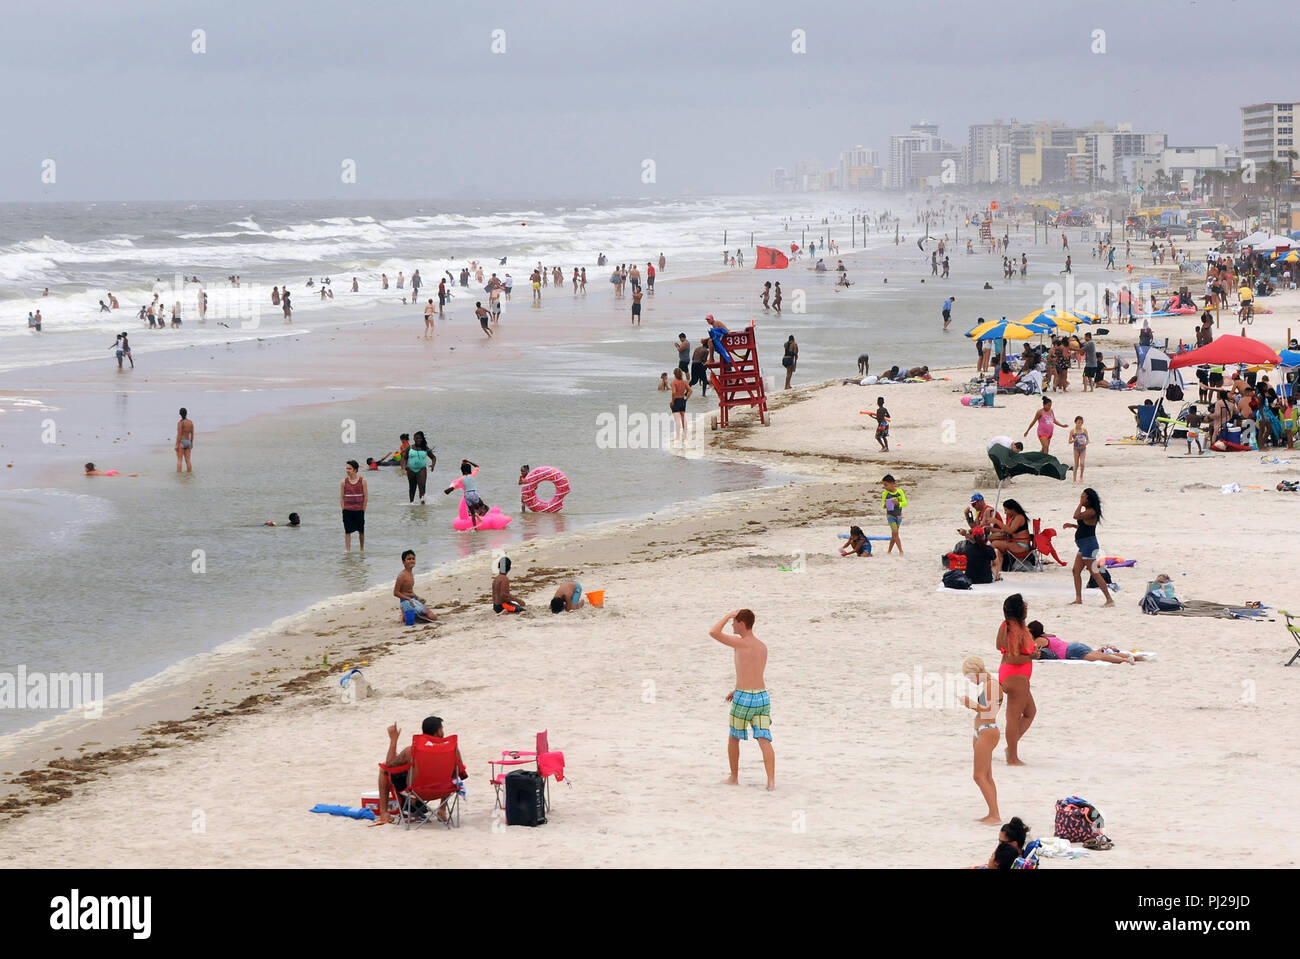 daytona-beach-florida-usa-3rd-sept-2018-